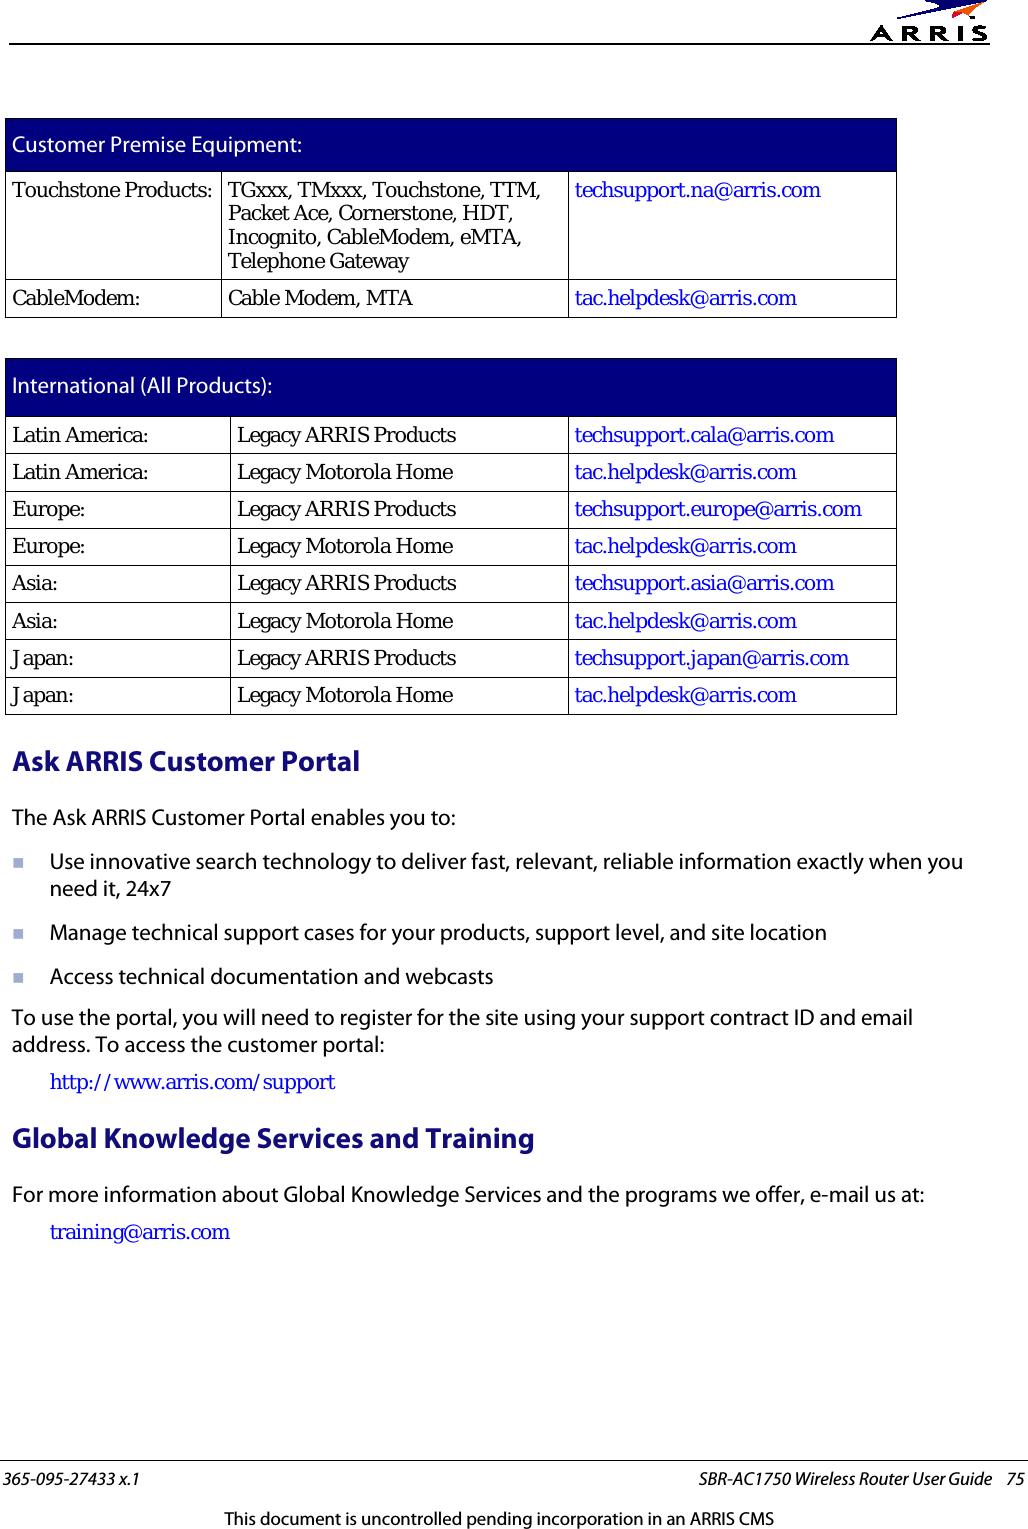 wecast manual pdf